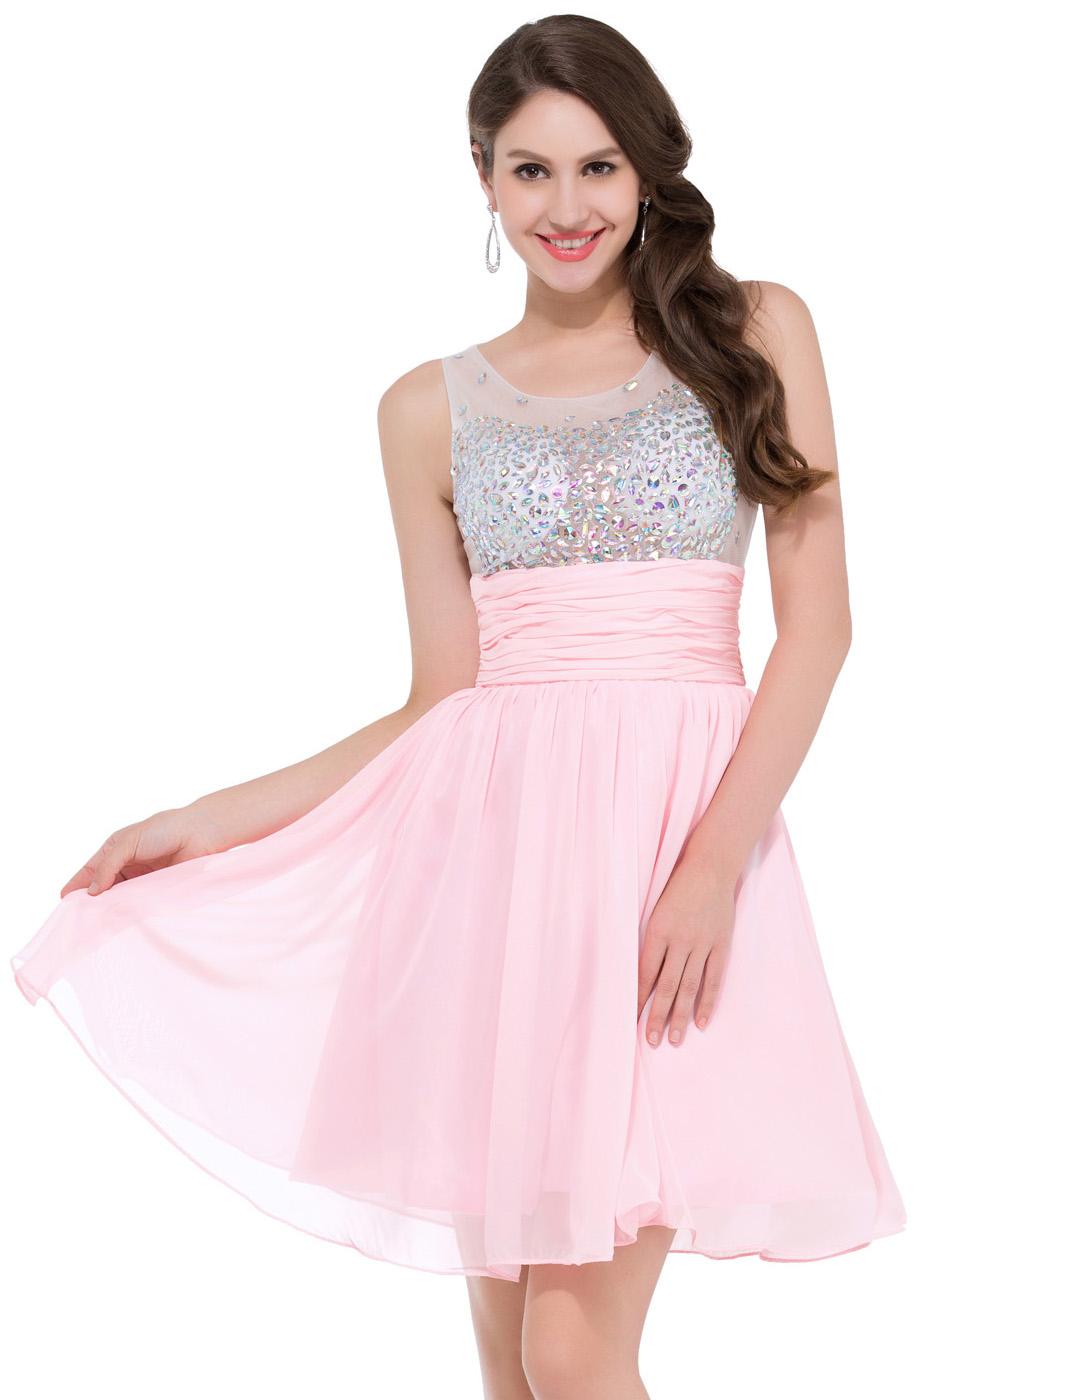 Short Pink Cocktail Dresses | Beatific Bride